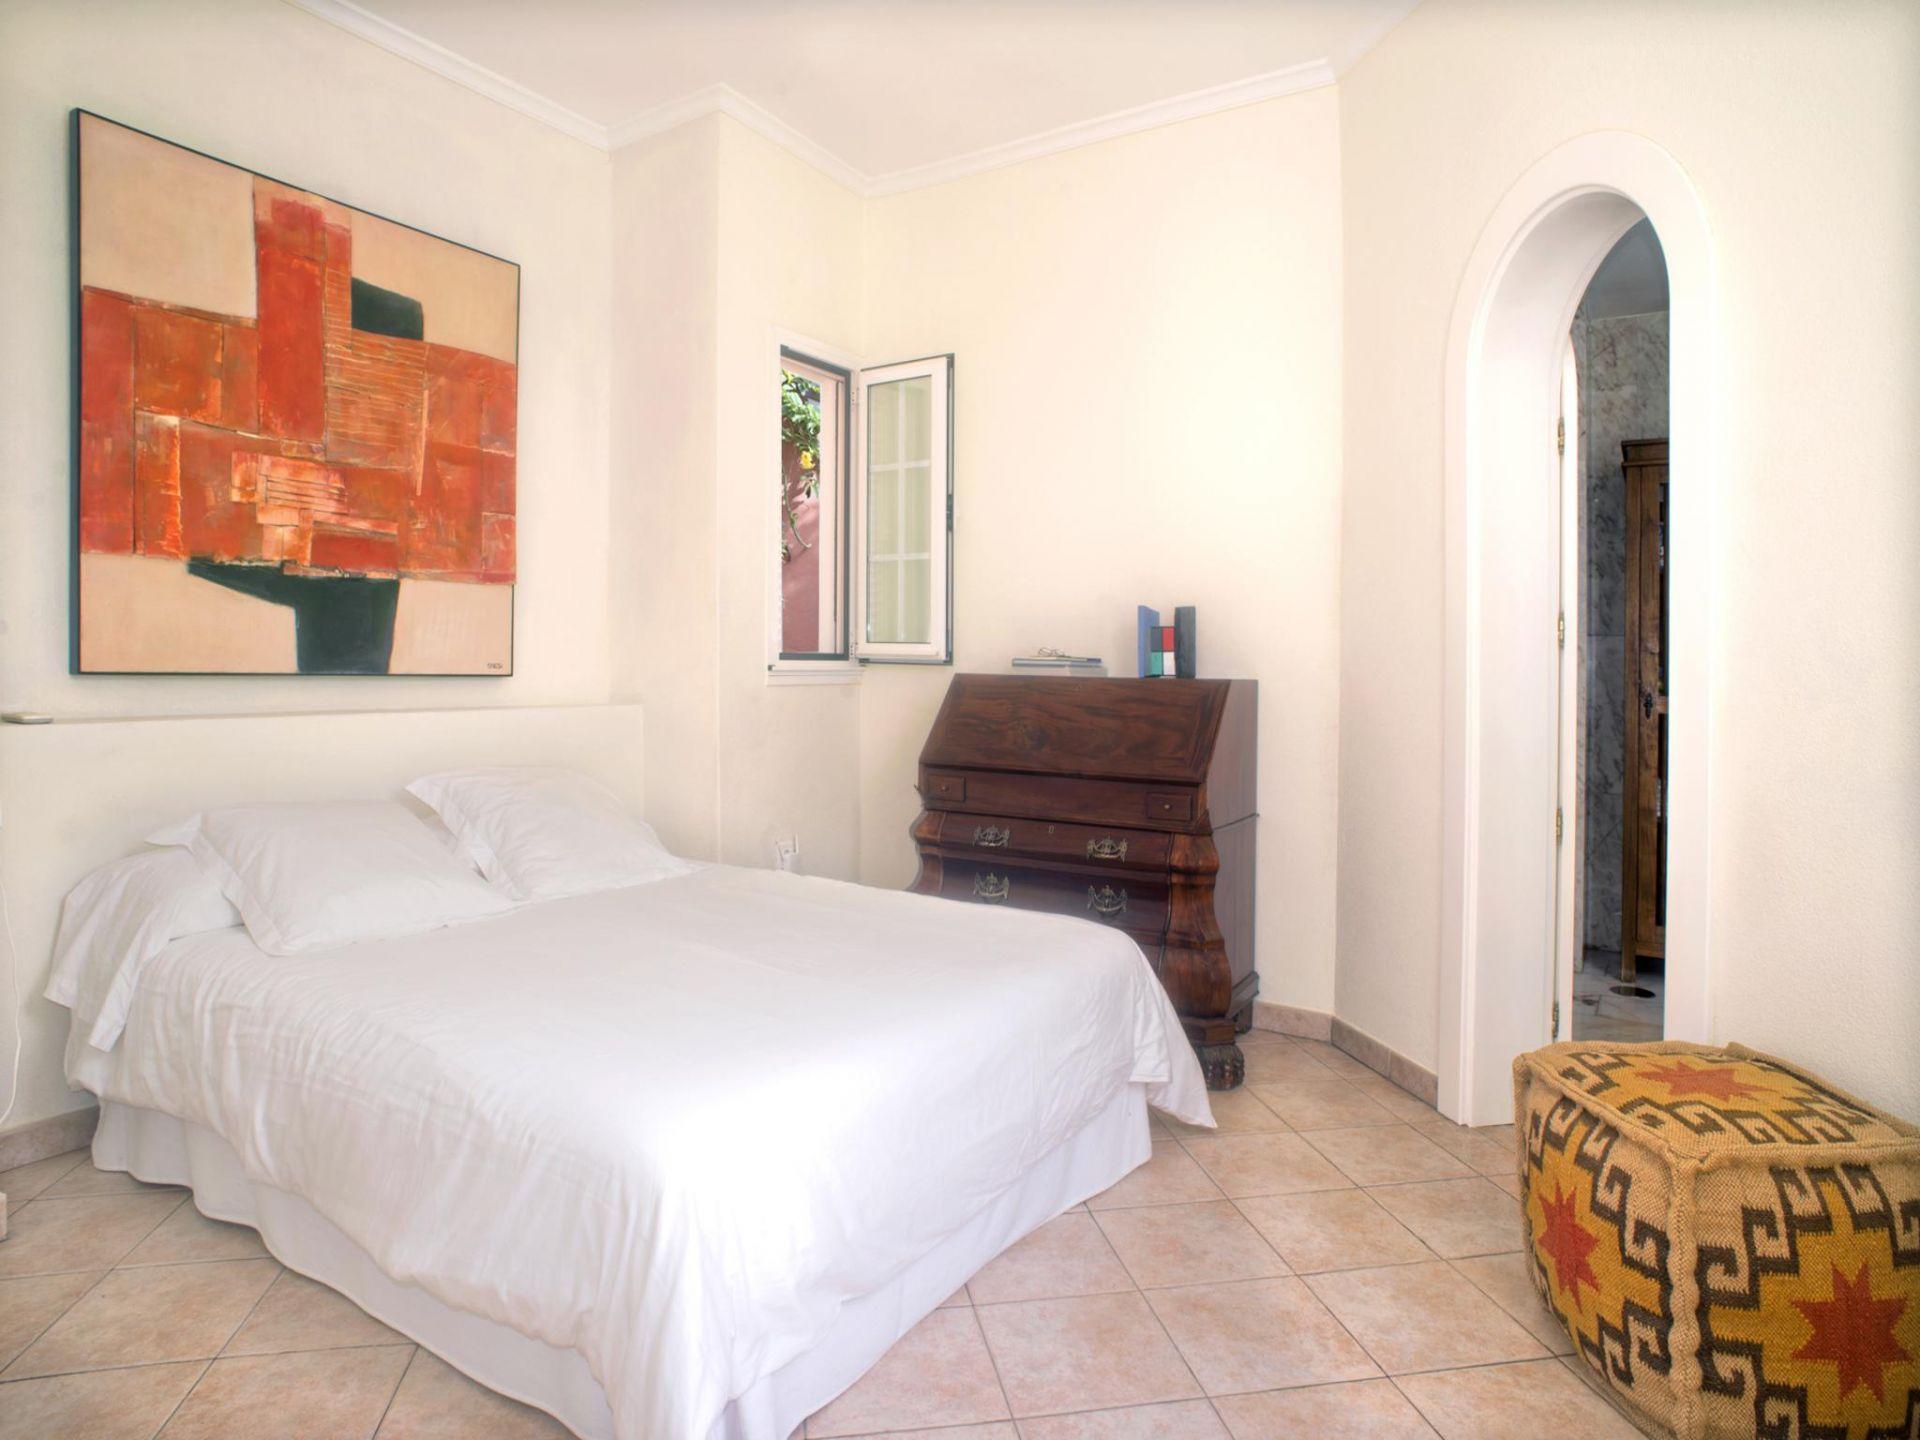 Holiday apartment Villa San Agustin 10 - Holiday Rental (854295), Maspalomas, Gran Canaria, Canary Islands, Spain, picture 17